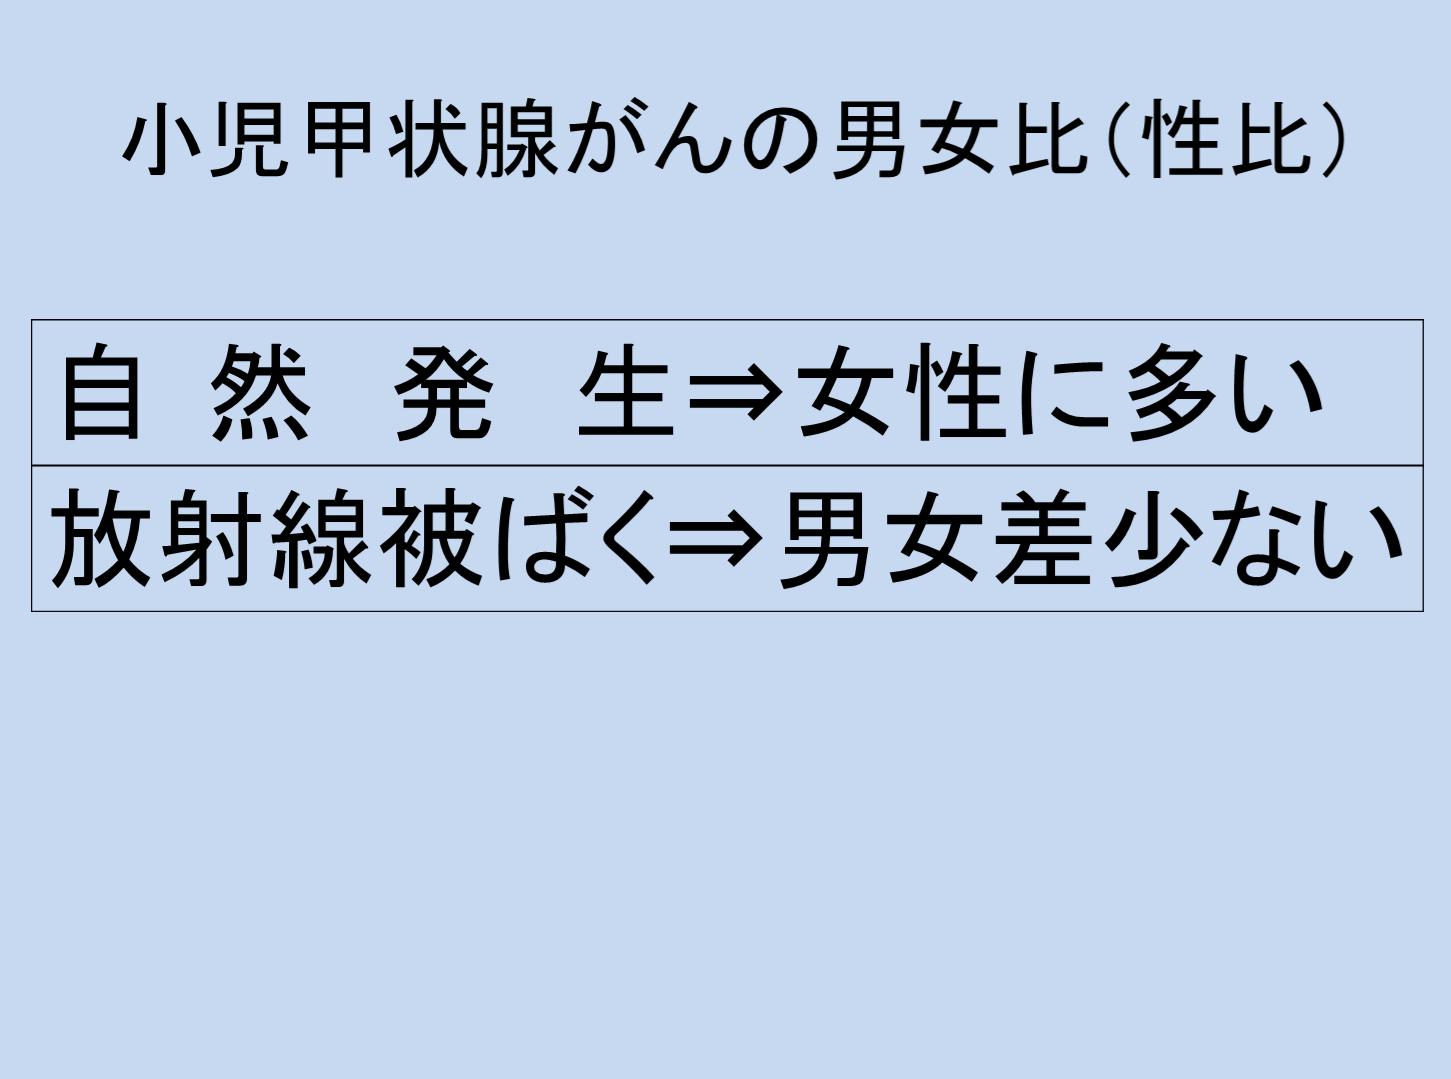 DrMatsuzaki018.png